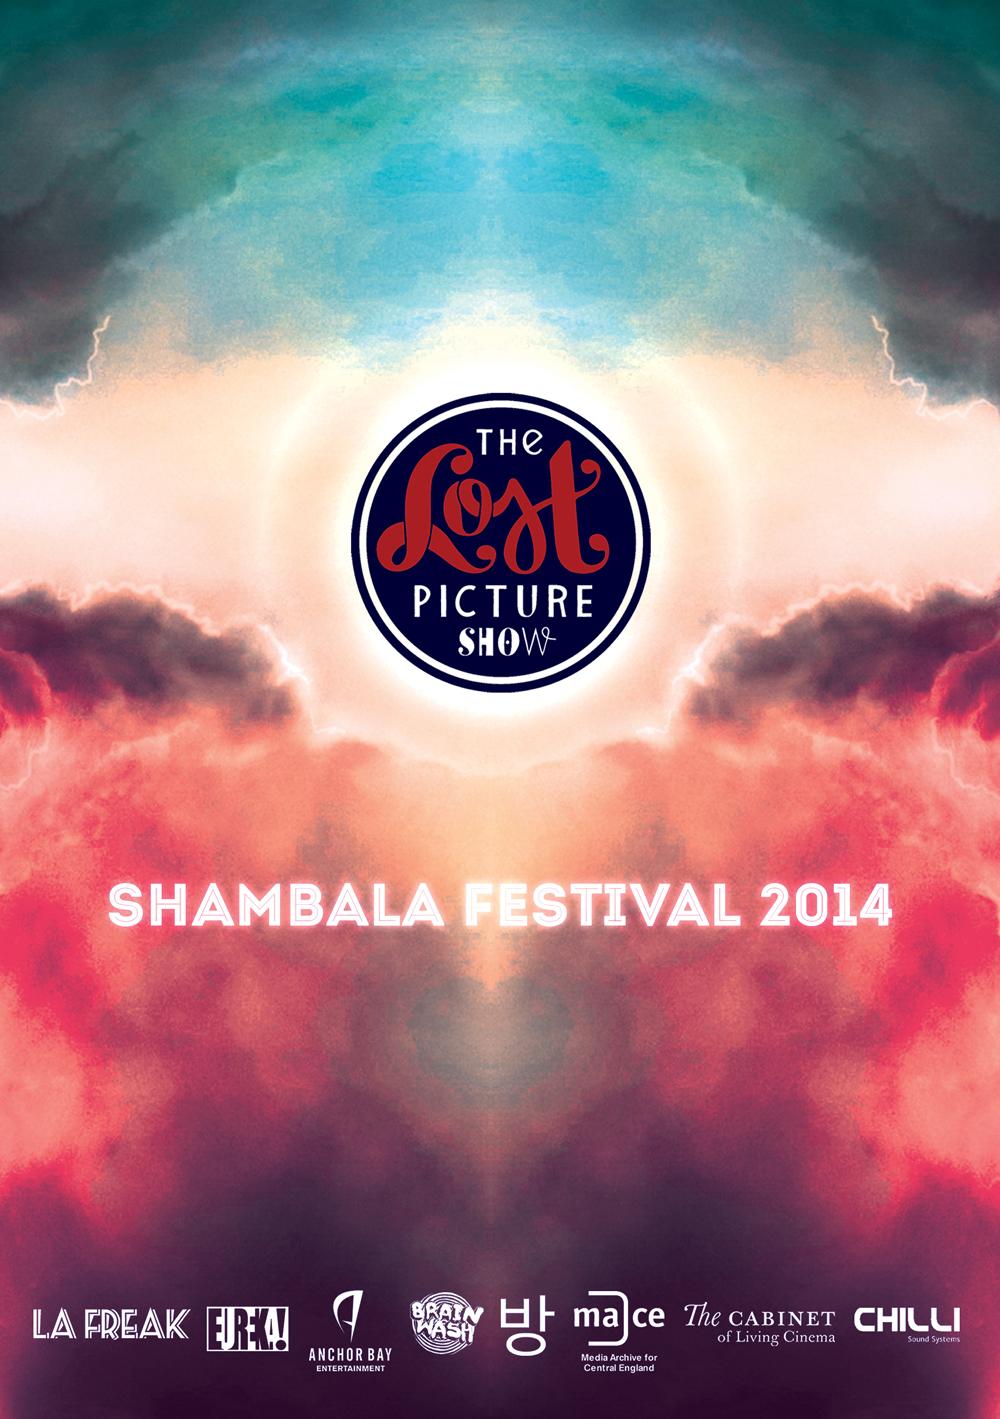 LOST PICTURE SHOW | SHAMBALA 2014